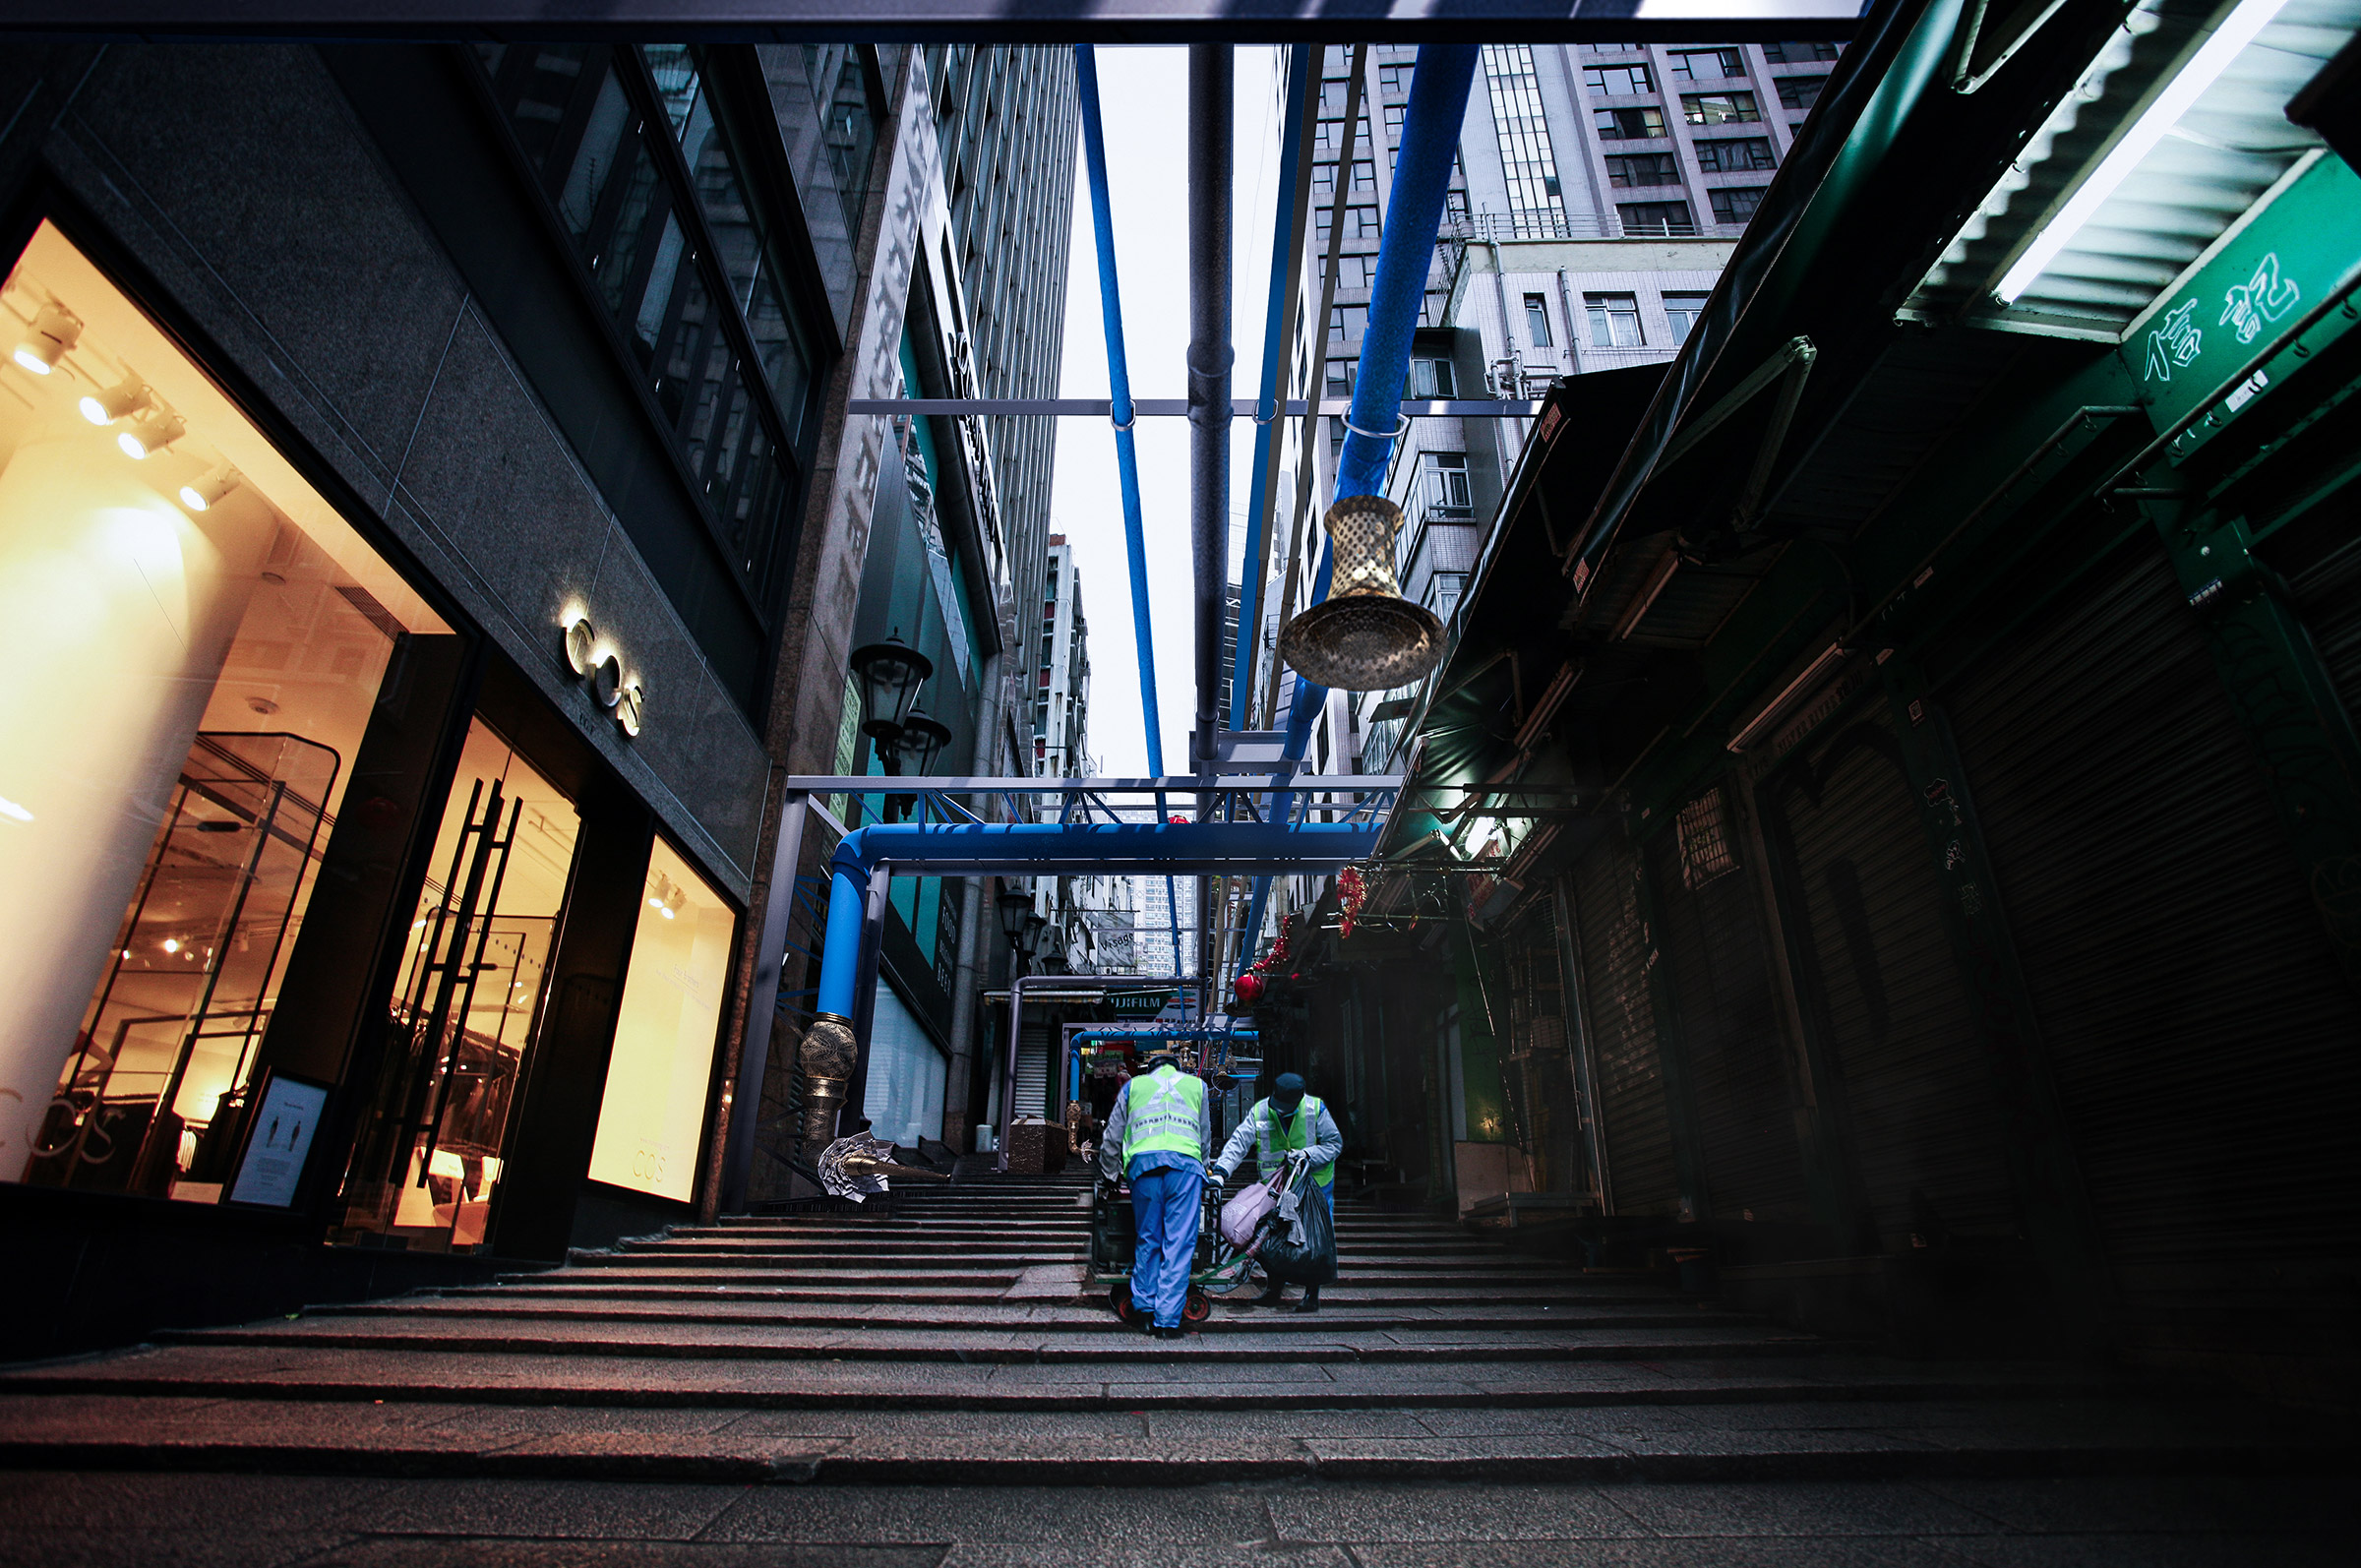 verasustudio_Fountain of the liquid stone_New Hindu Urban scared space_Pottinger Street, Hongkong_architecture